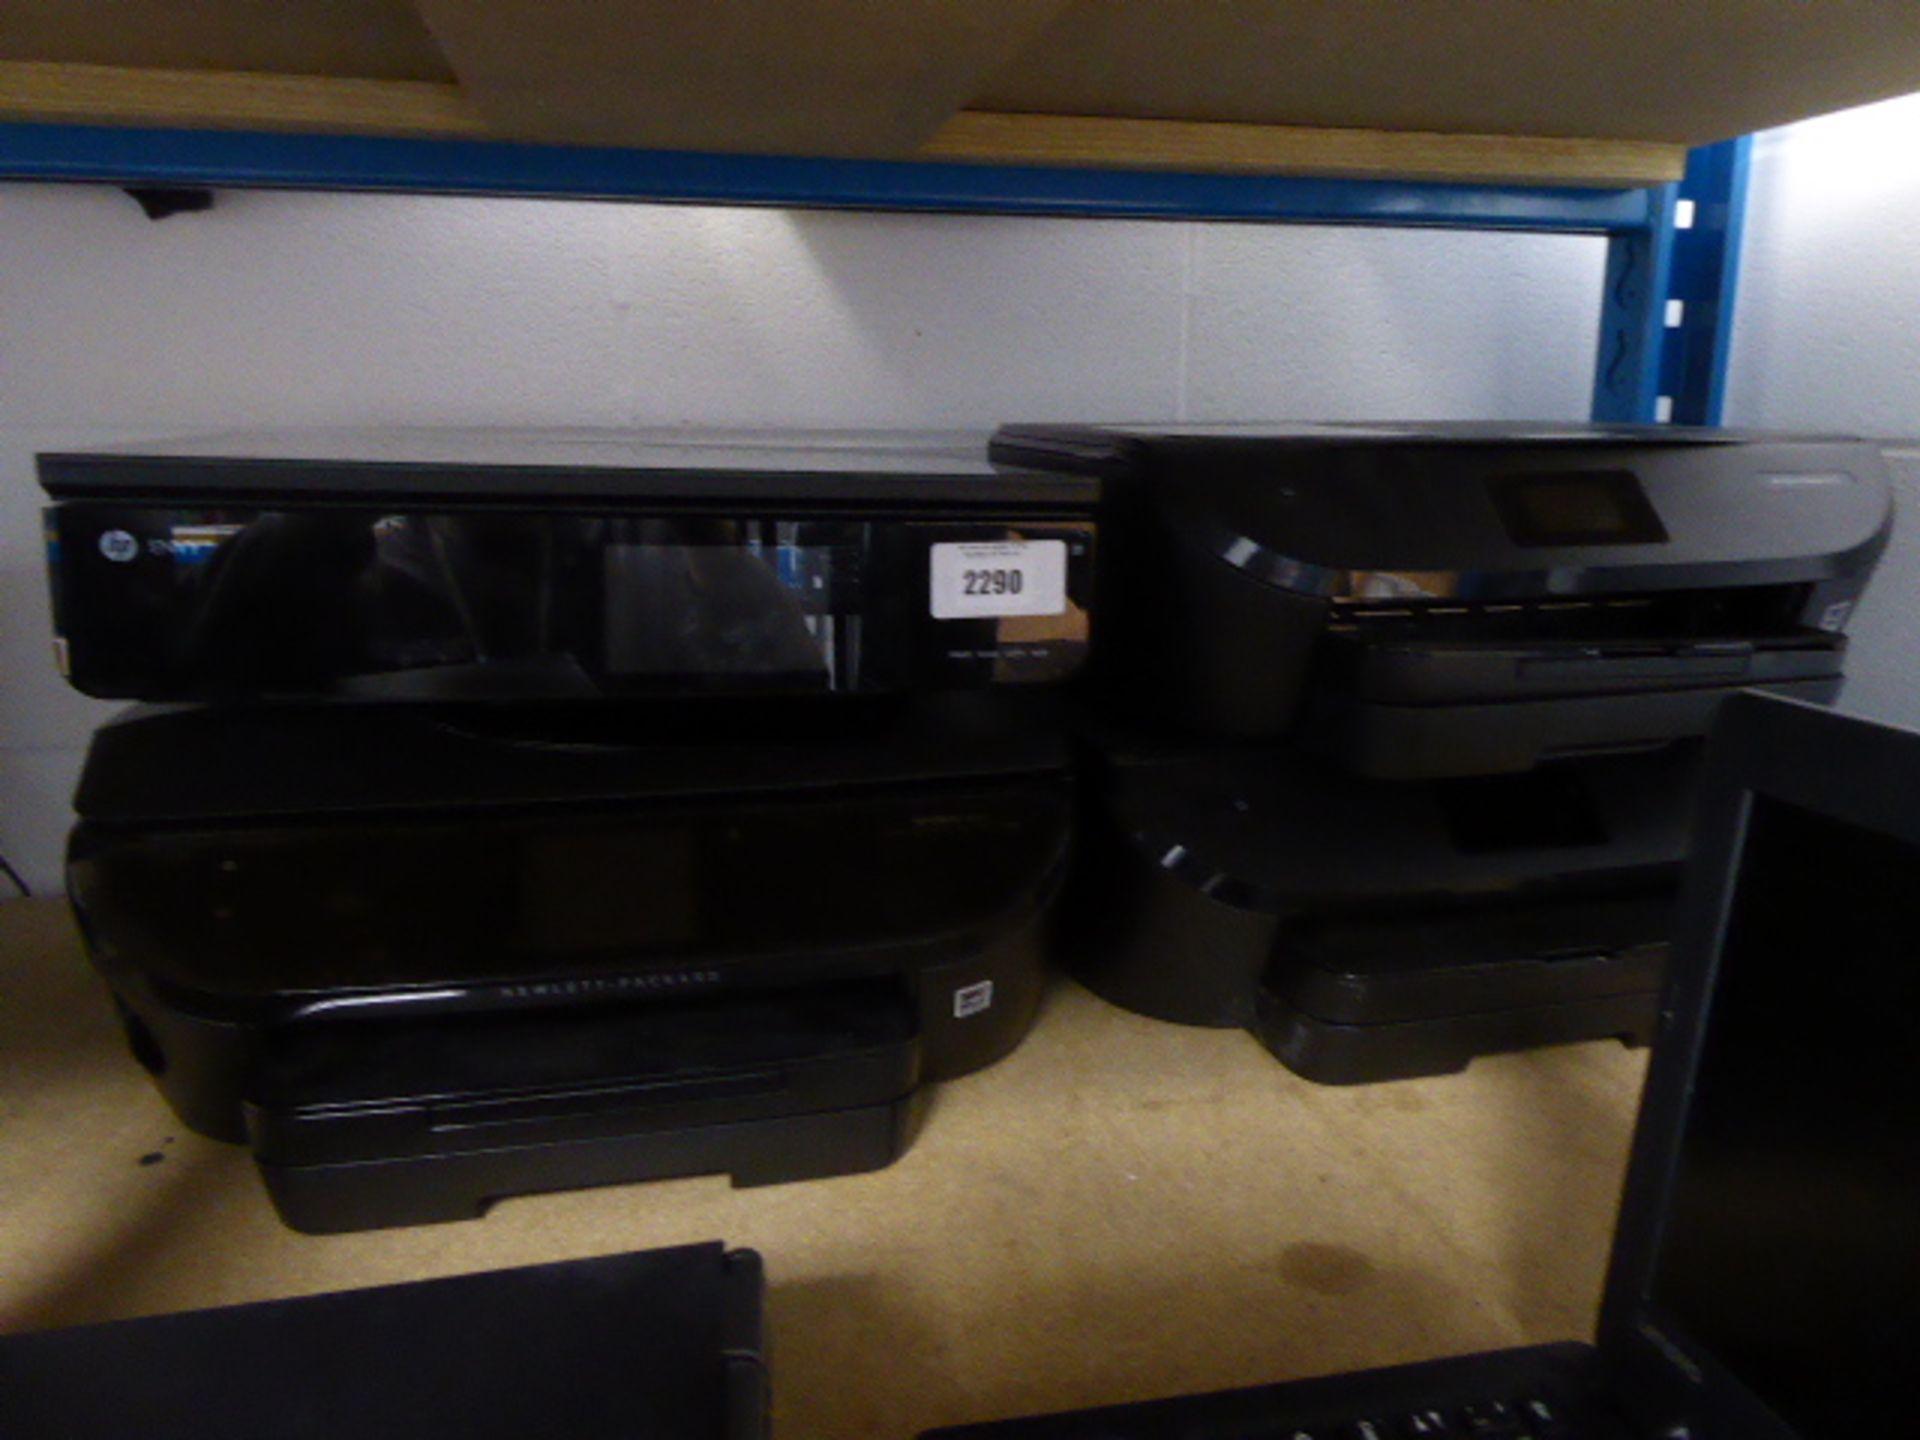 Lotto 2290 - 4 various HP printers incl. HP Envy 120